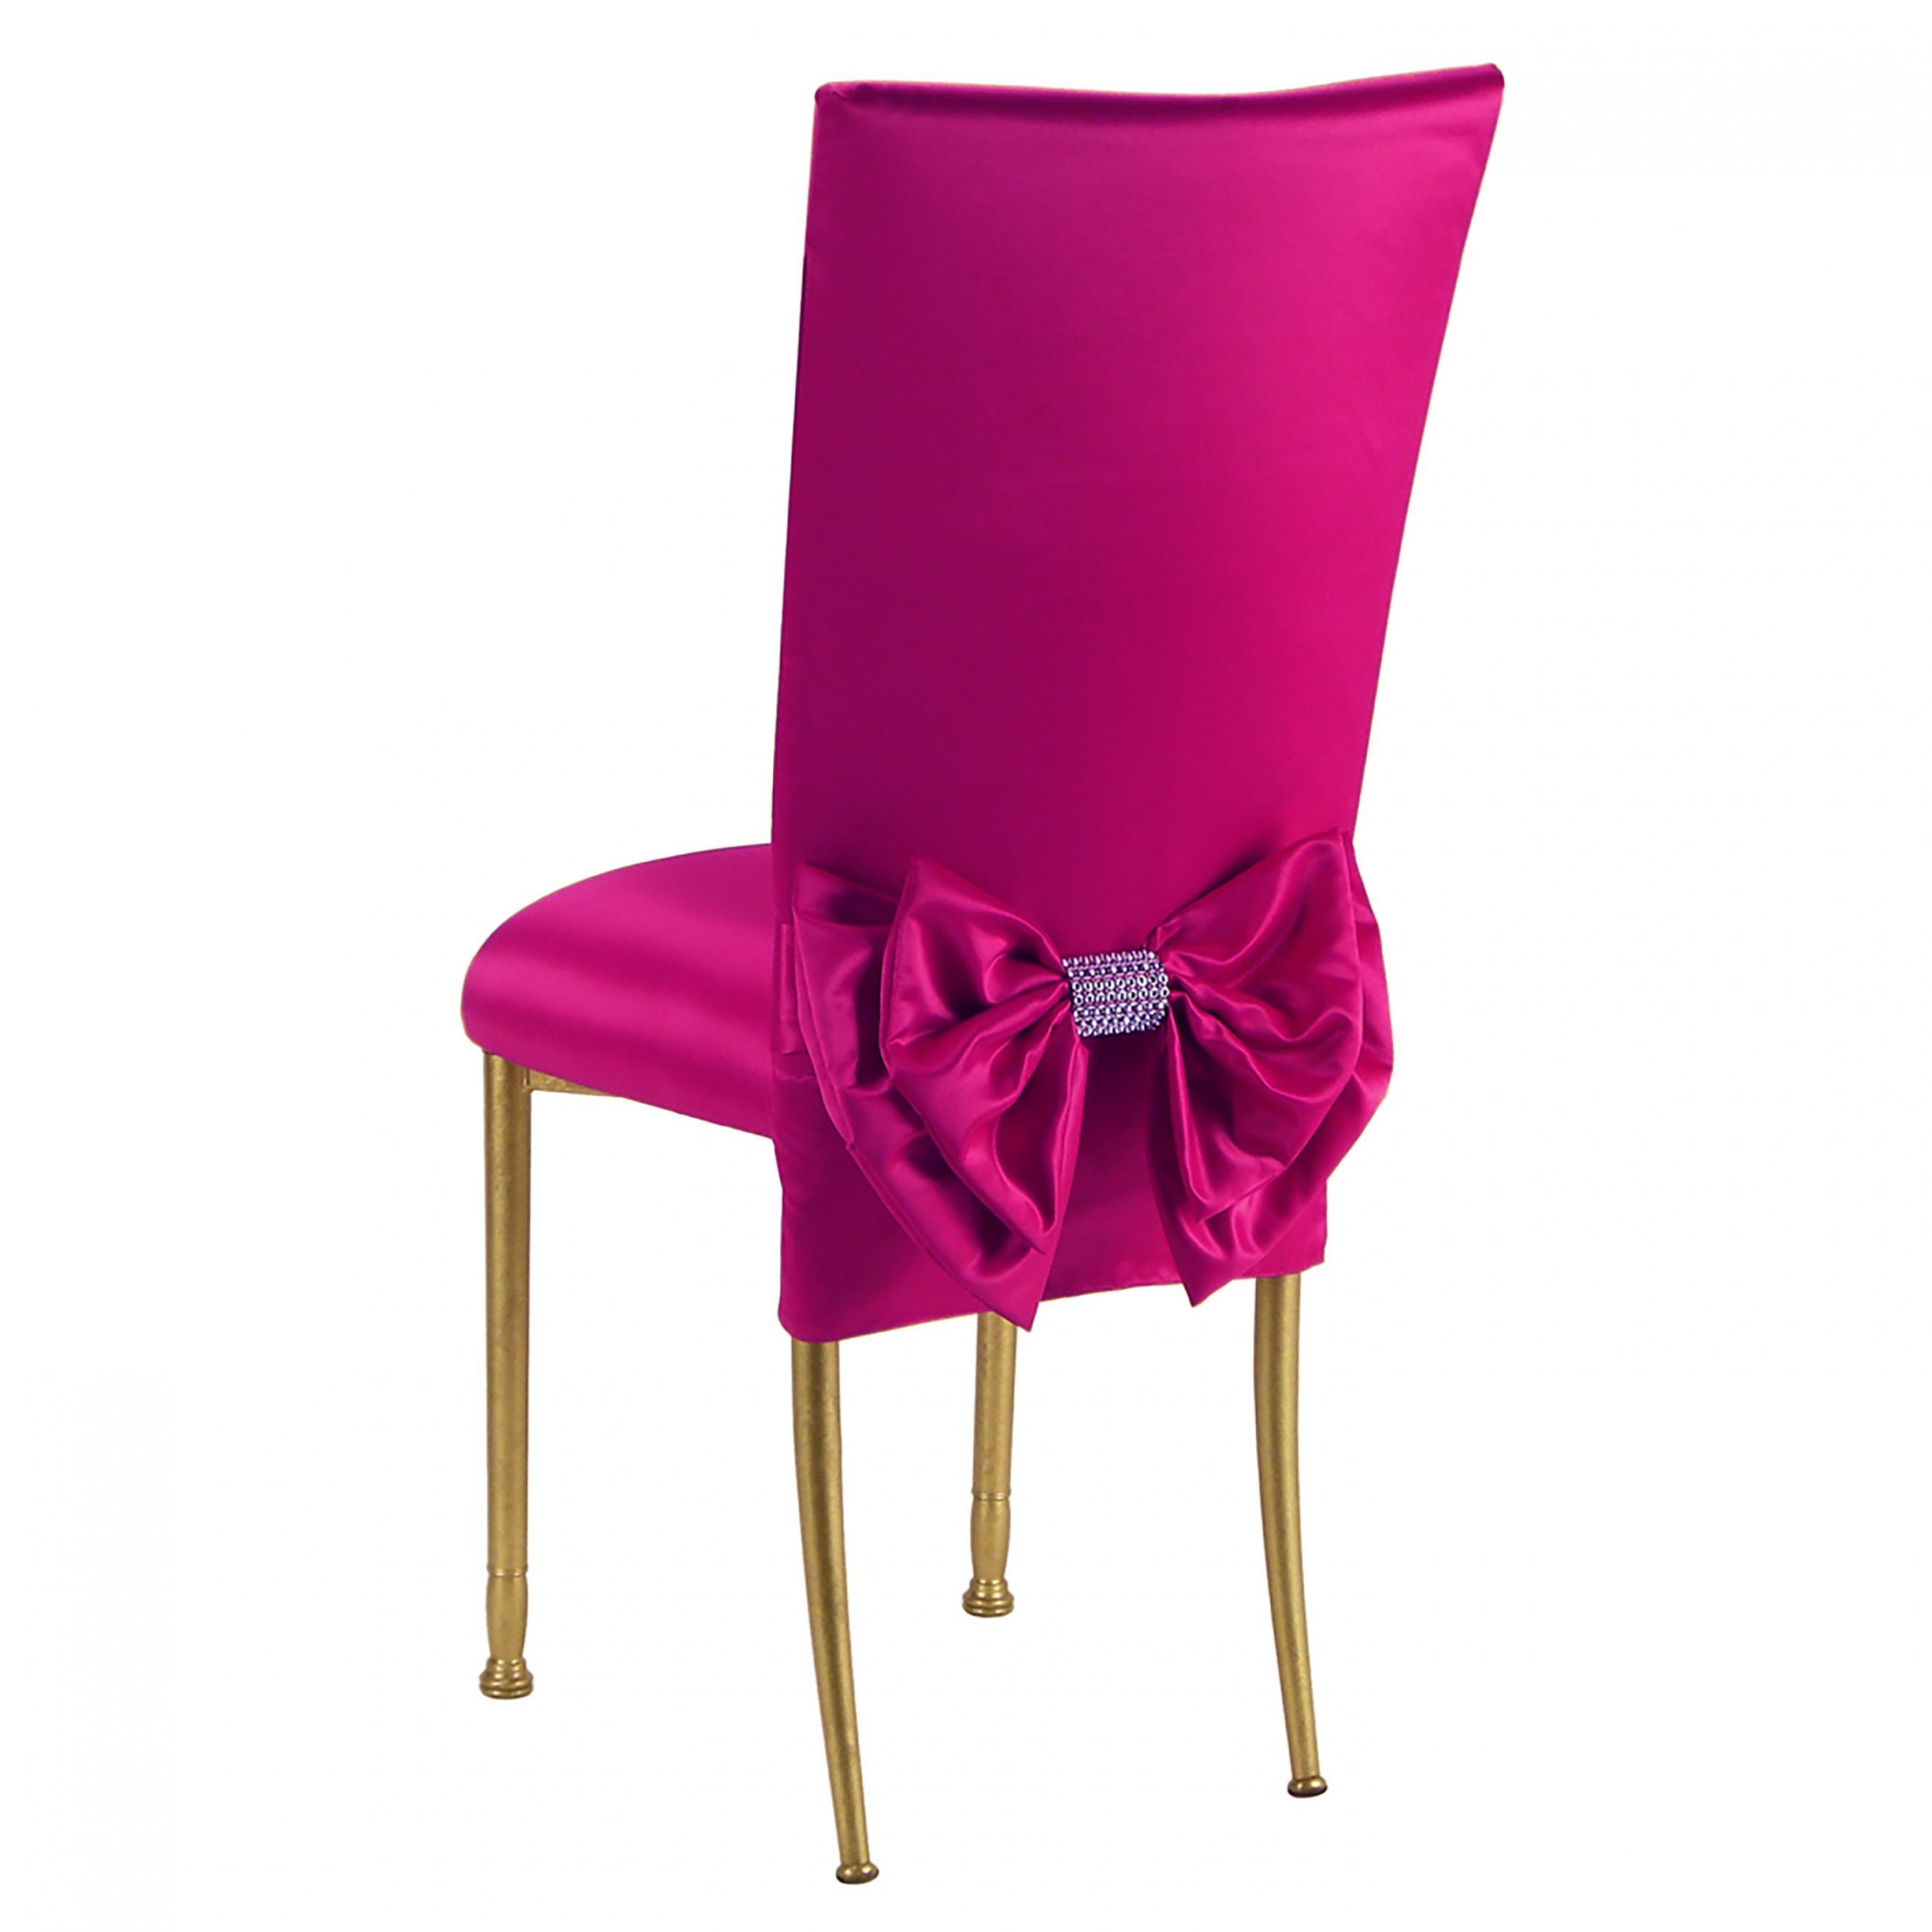 Strange Satin Fuchsia 3 4 Fanfare Chameleon Chair Topper Peak Bralicious Painted Fabric Chair Ideas Braliciousco